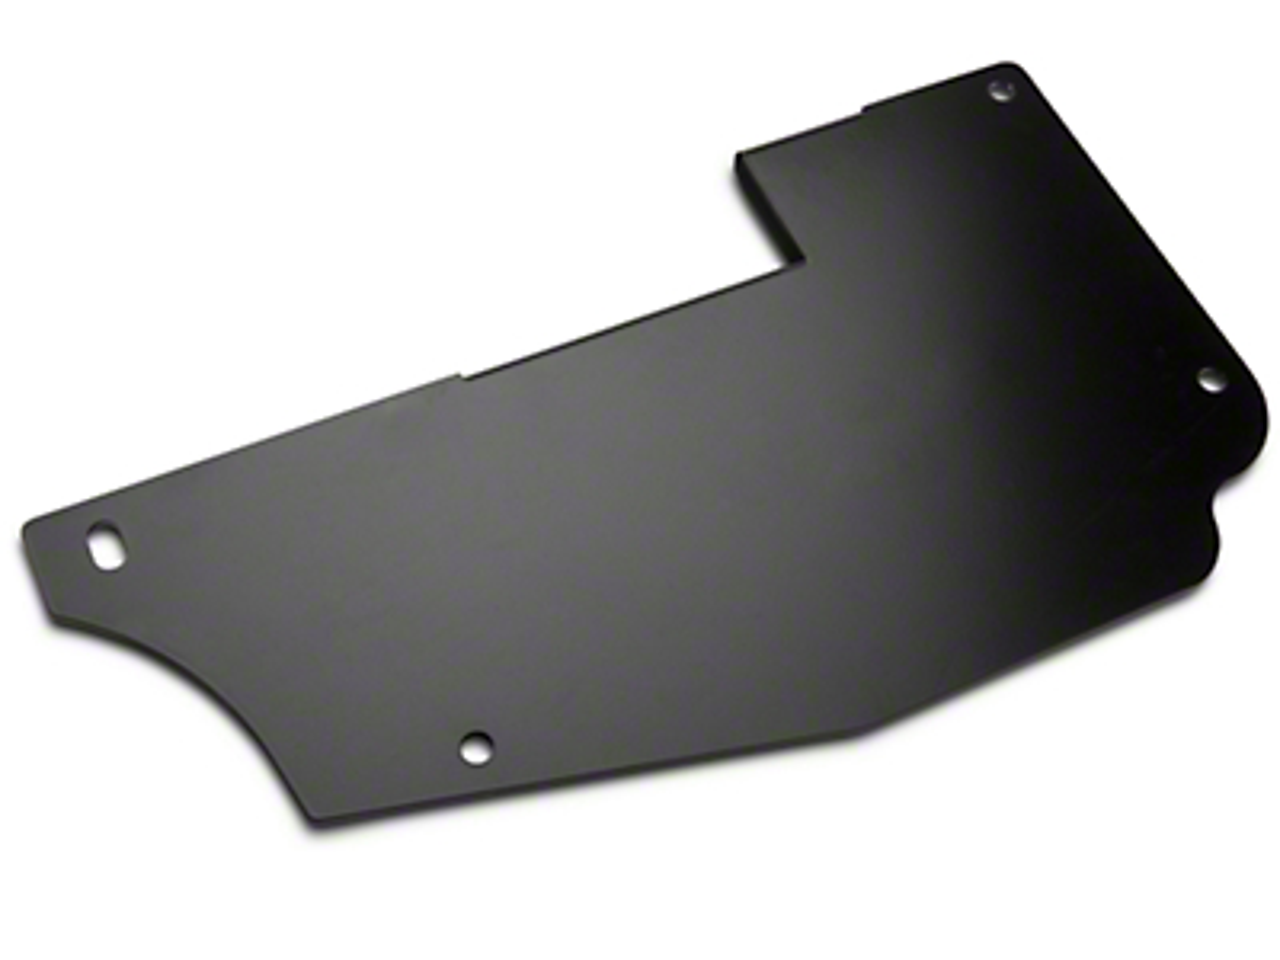 M.O.R.E. Transfer Case Skid Plate (07-18 Wrangler JK)